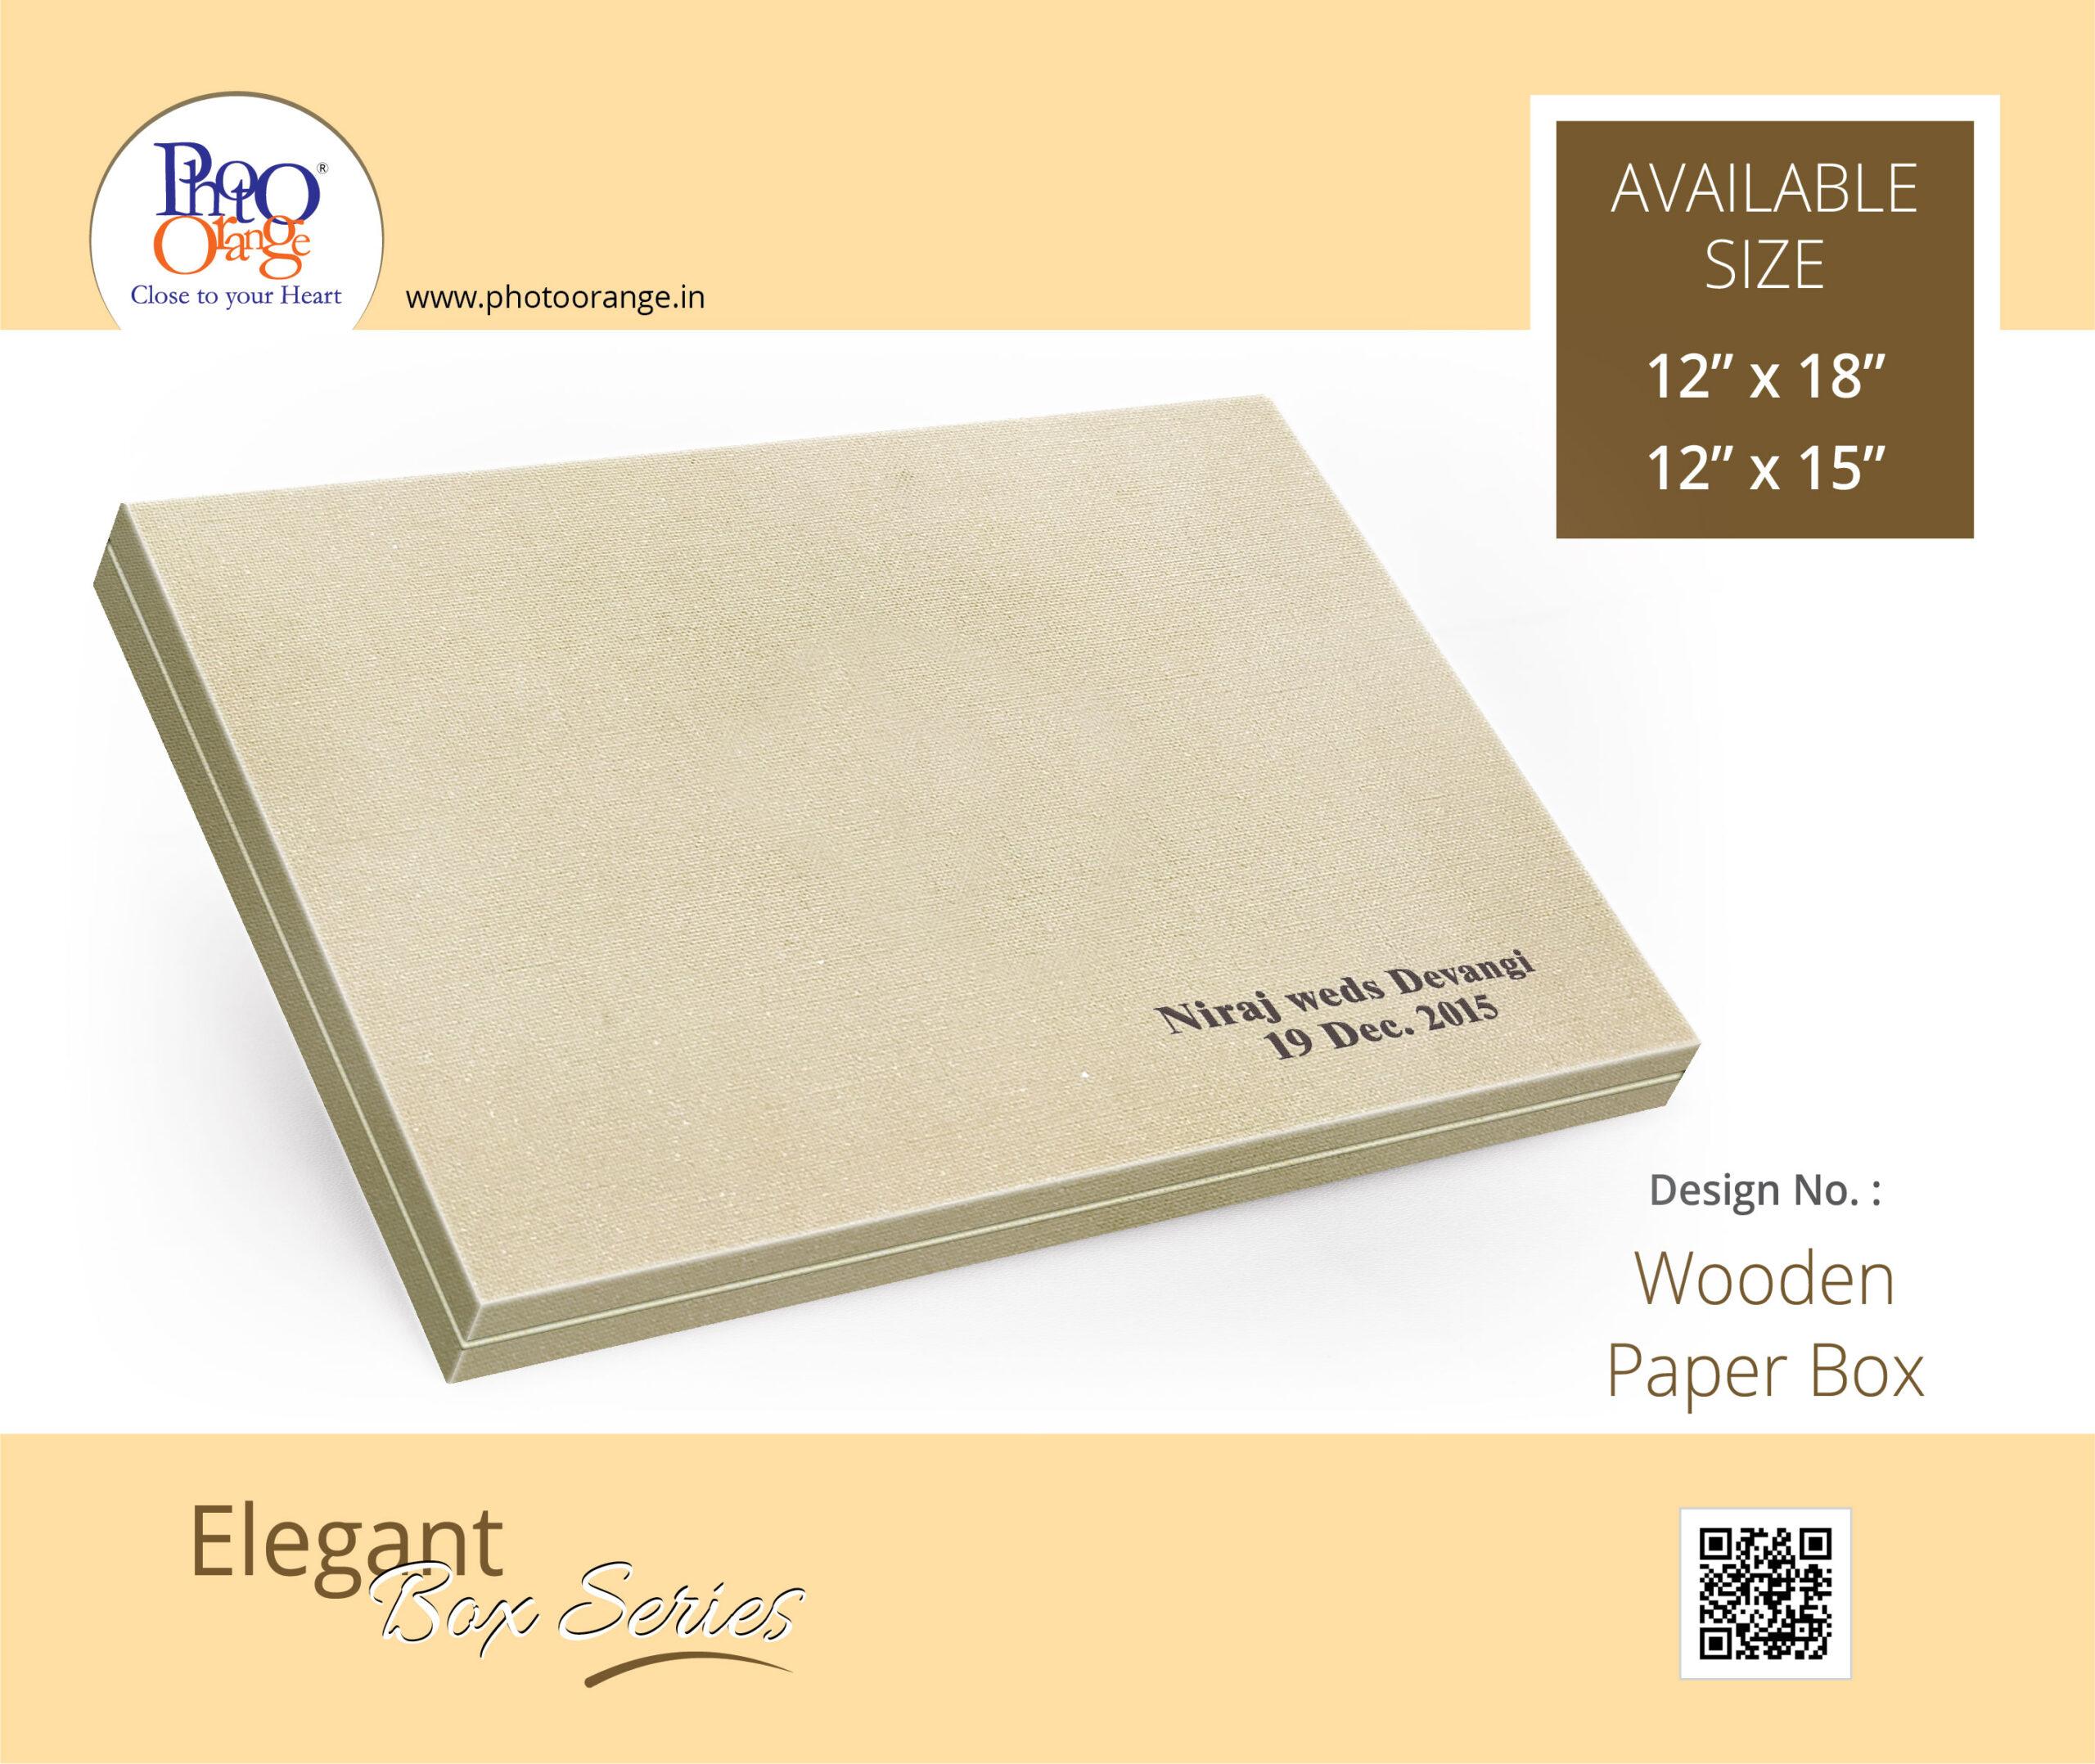 Wooden Paper Box